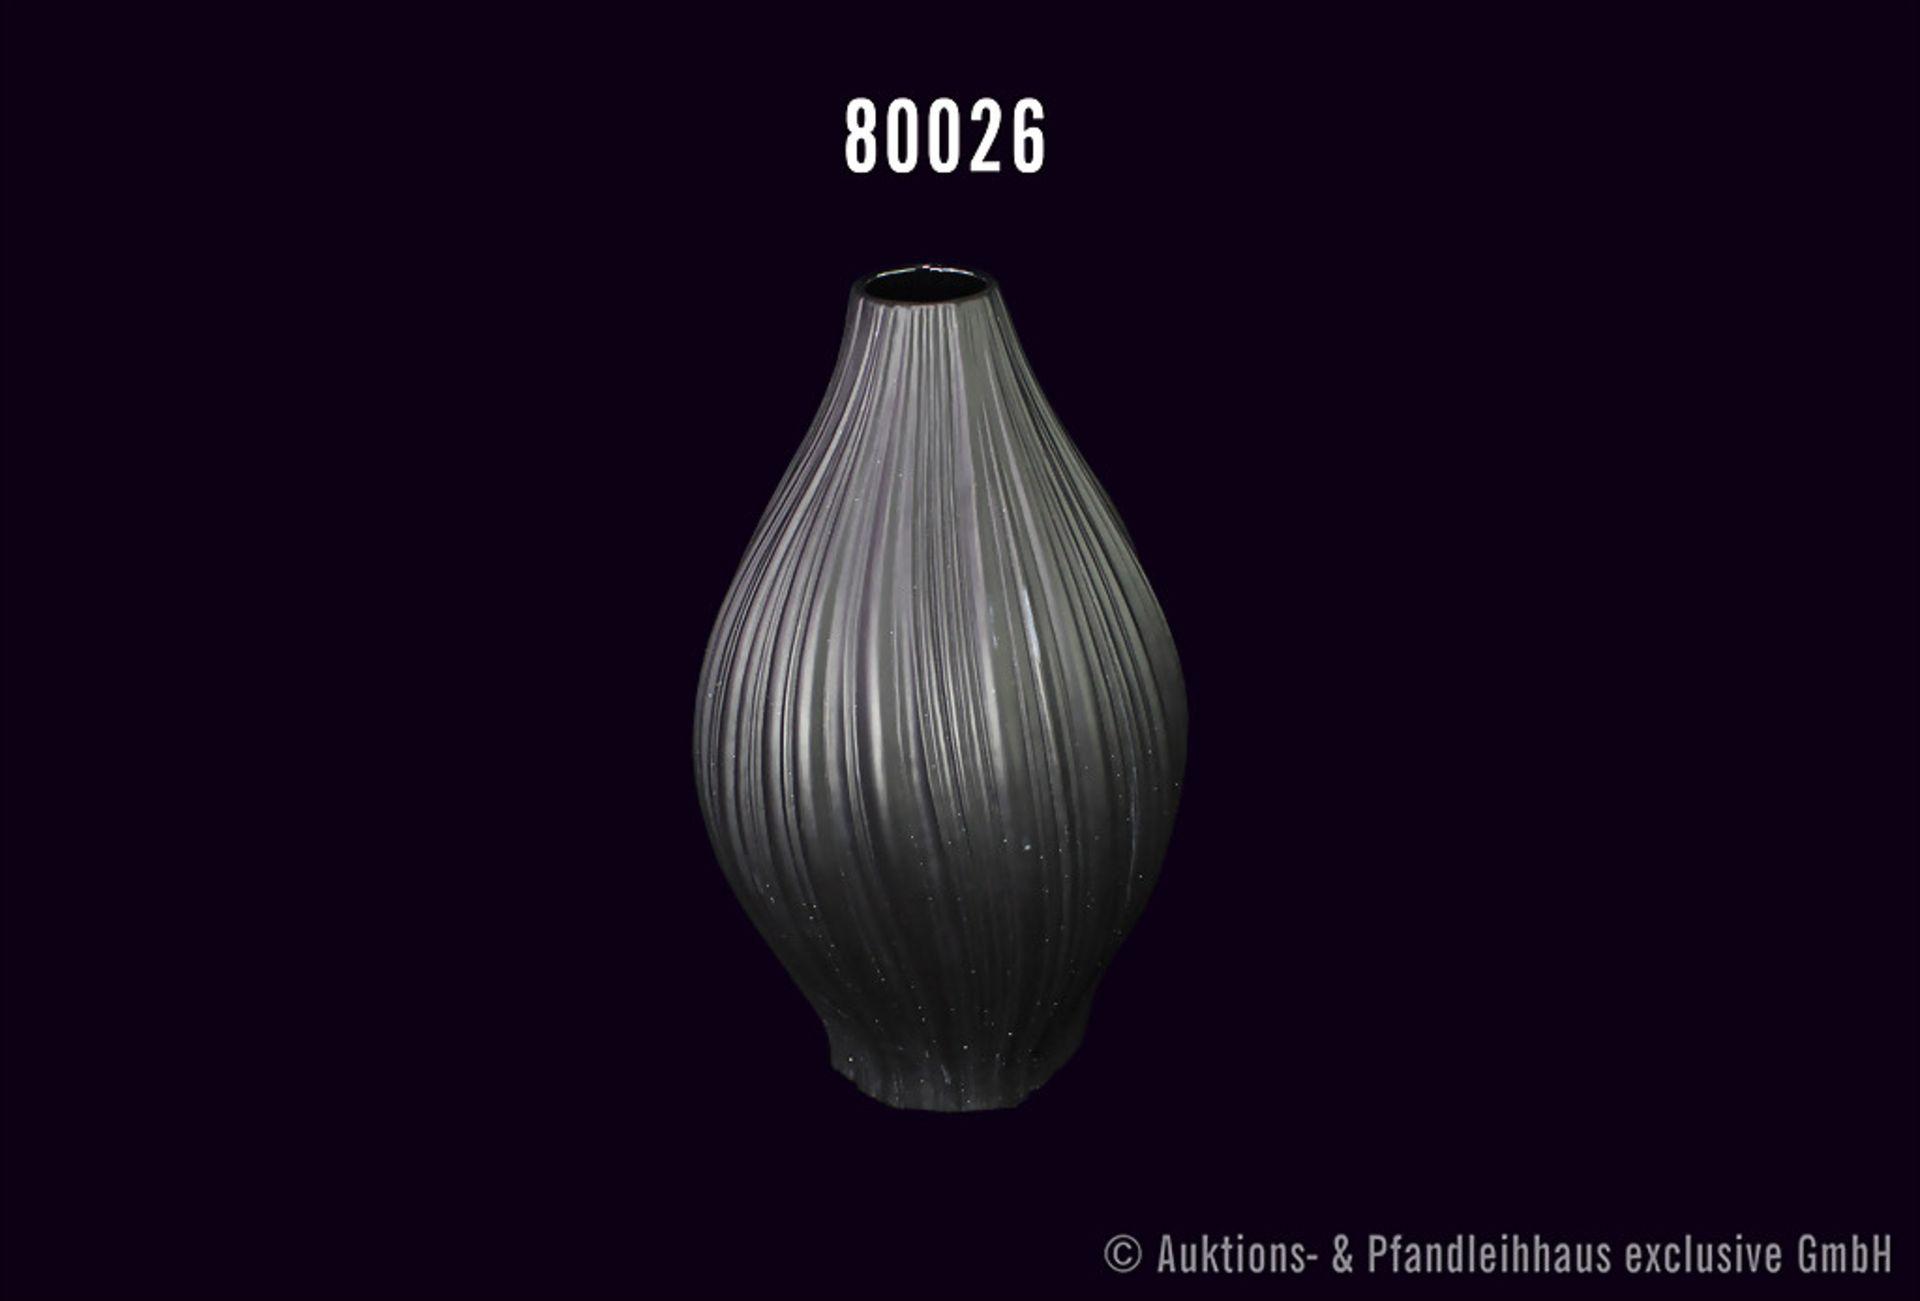 Rosenthal Porzellan Vase, schwarz, Plissee Vase, Entwurf Martin Freyer 1968, H 33 cm, Vase ist